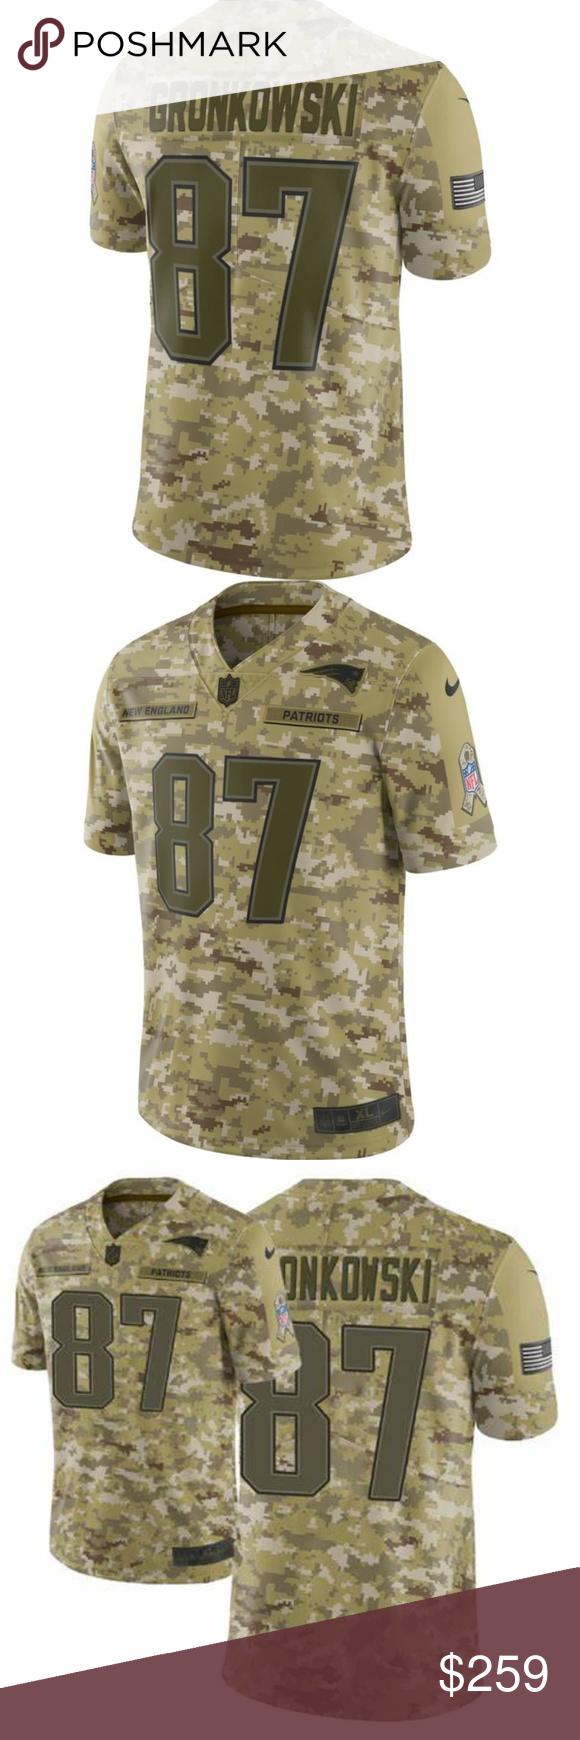 New England Patriots Gronkowski Camo Jersey Gronk Awesome Rare 2018 Nike Salute To Service Rob Gronkowski Jersey 100 Authentic Nike Nike Shirts Tees Shor